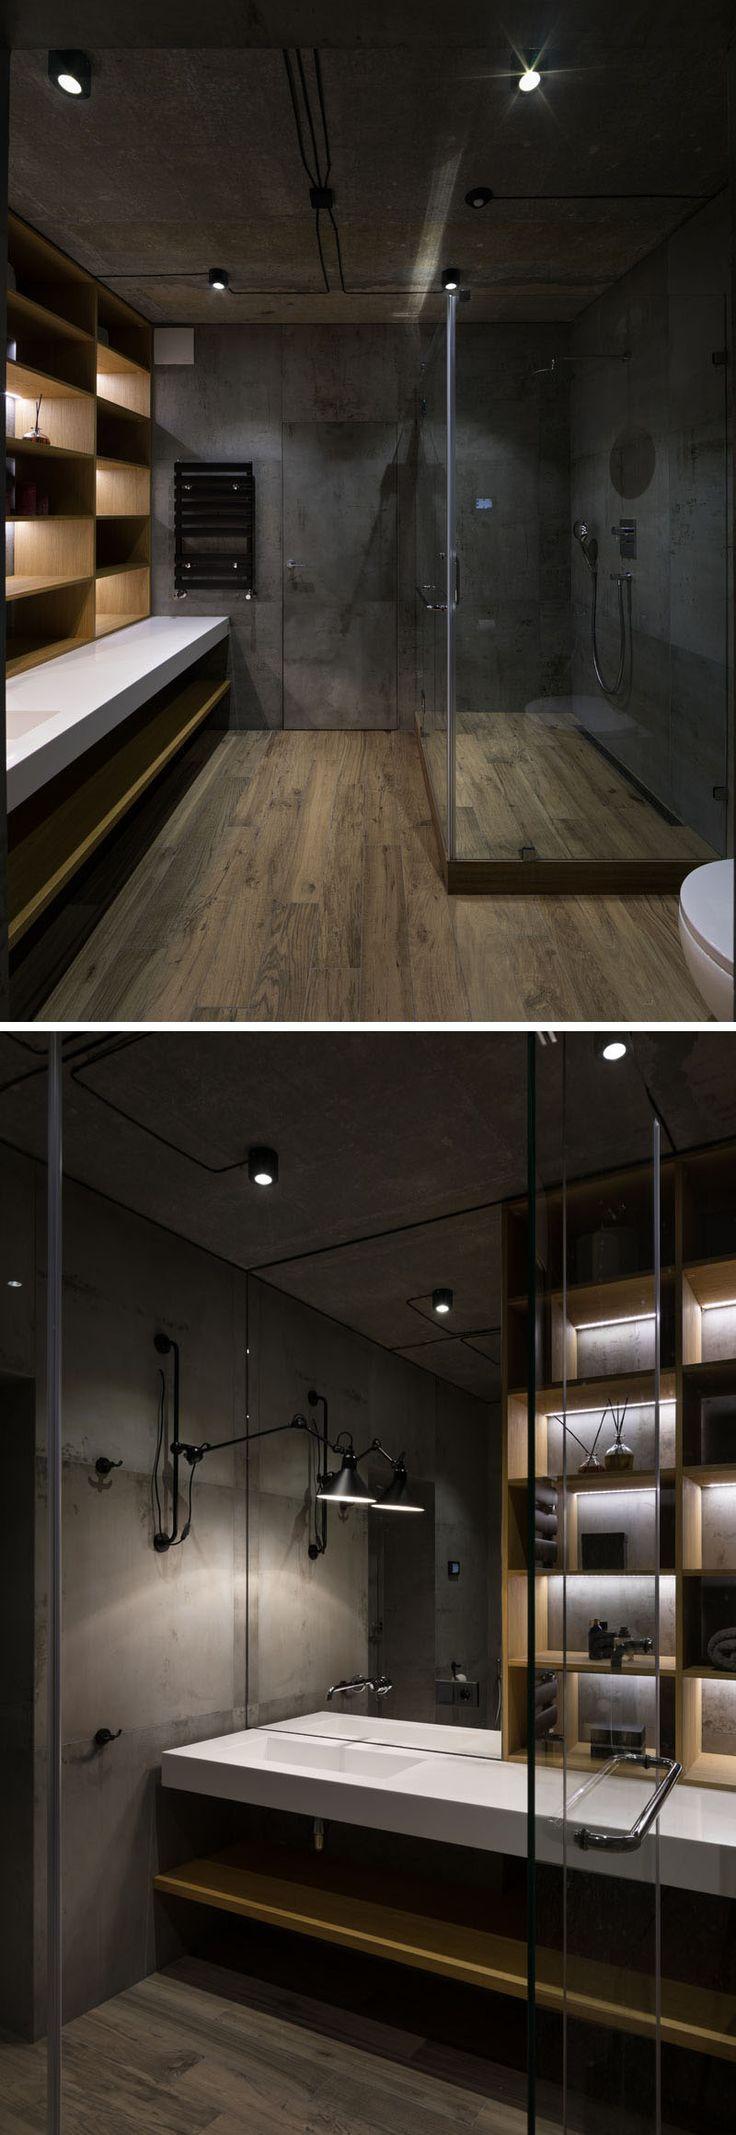 Central de arquitectura a mexico city based design studio has - Sergey Makhno Has Designed A Modern Apartment Interior In Kyiv Ukraine